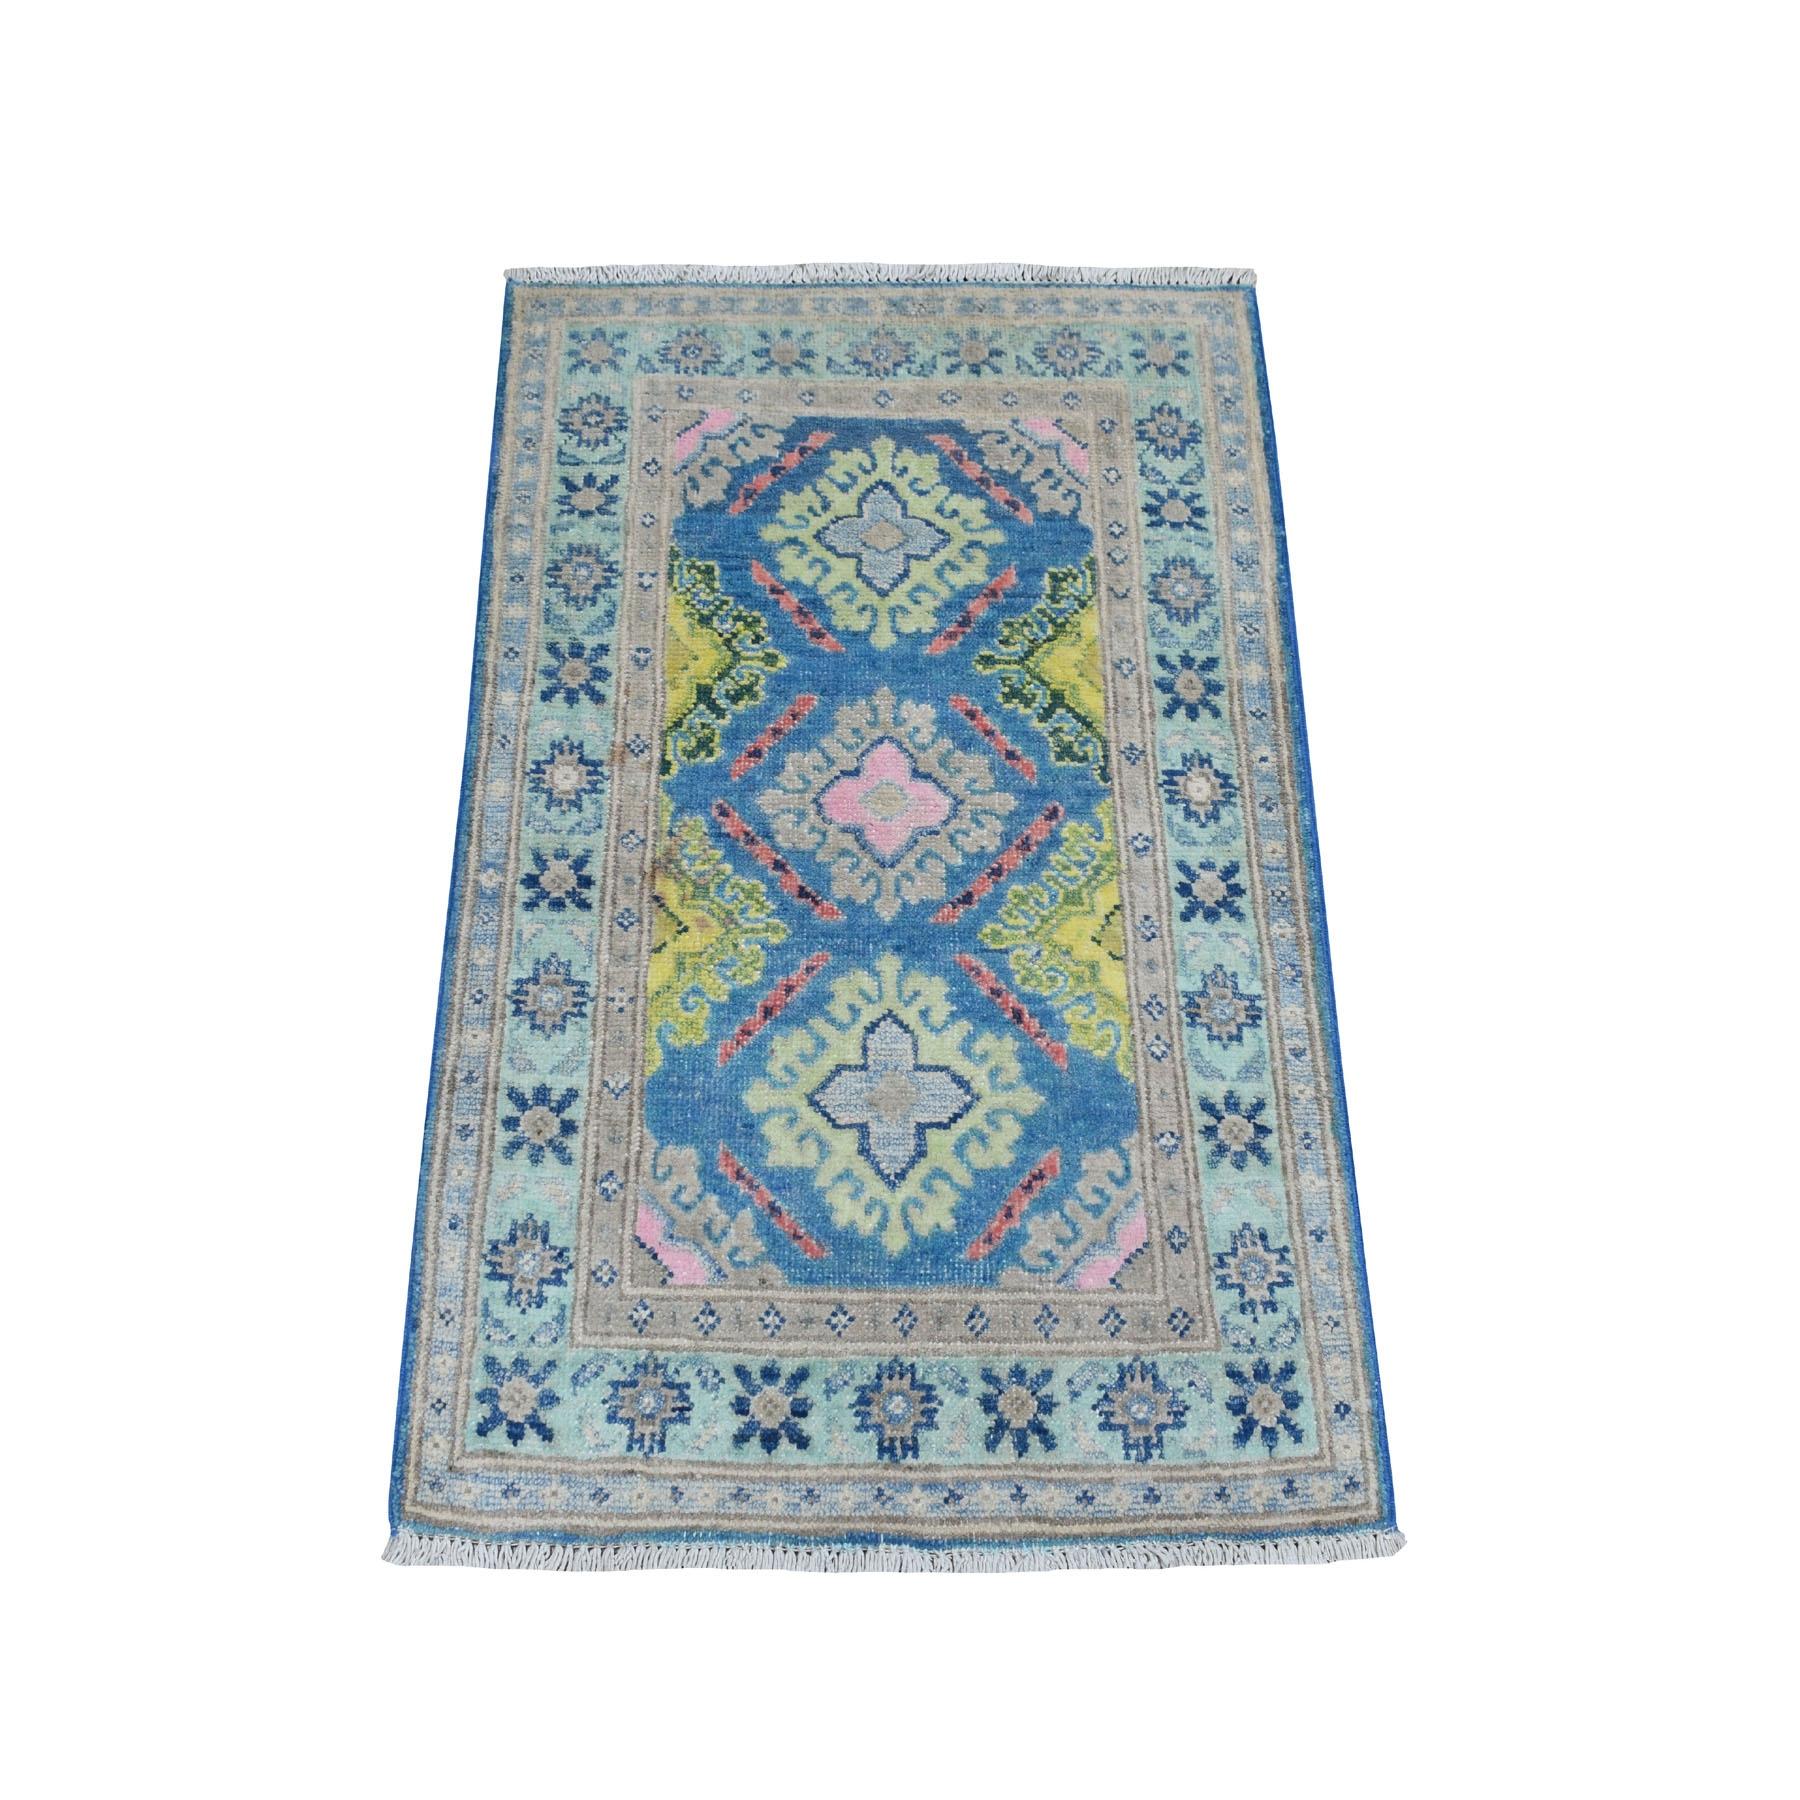 2'X3' Colorful Blue Fusion Kazak Pure Wool Hand Knotted Oriental Rug moaebc8e